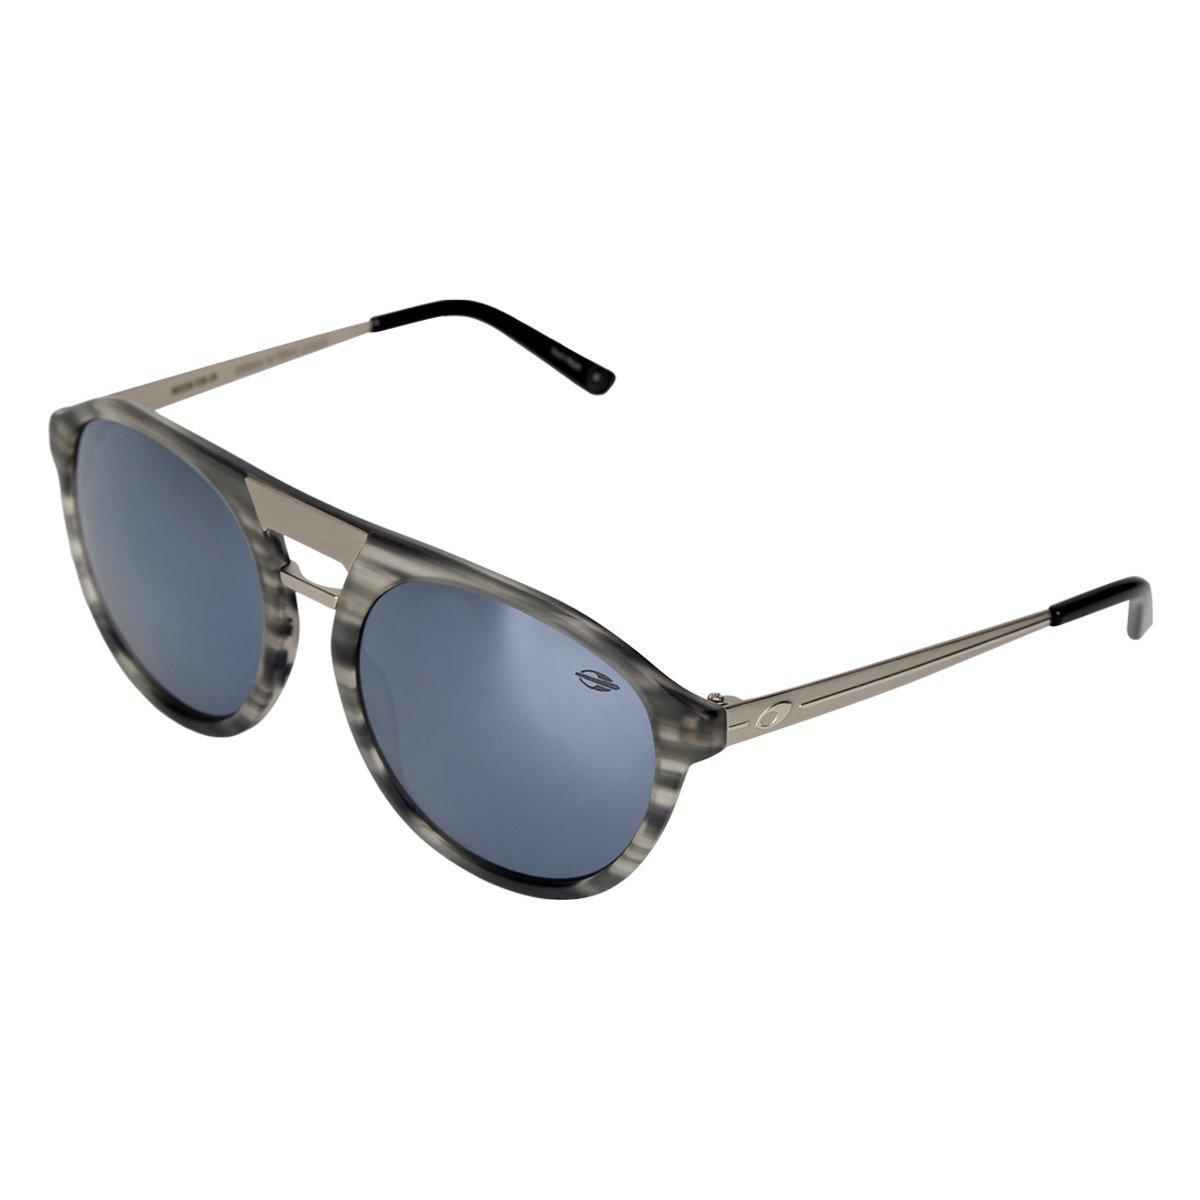 b521793a3c783 Óculos Sol Mormaii M0006 Masculino - Compre Agora